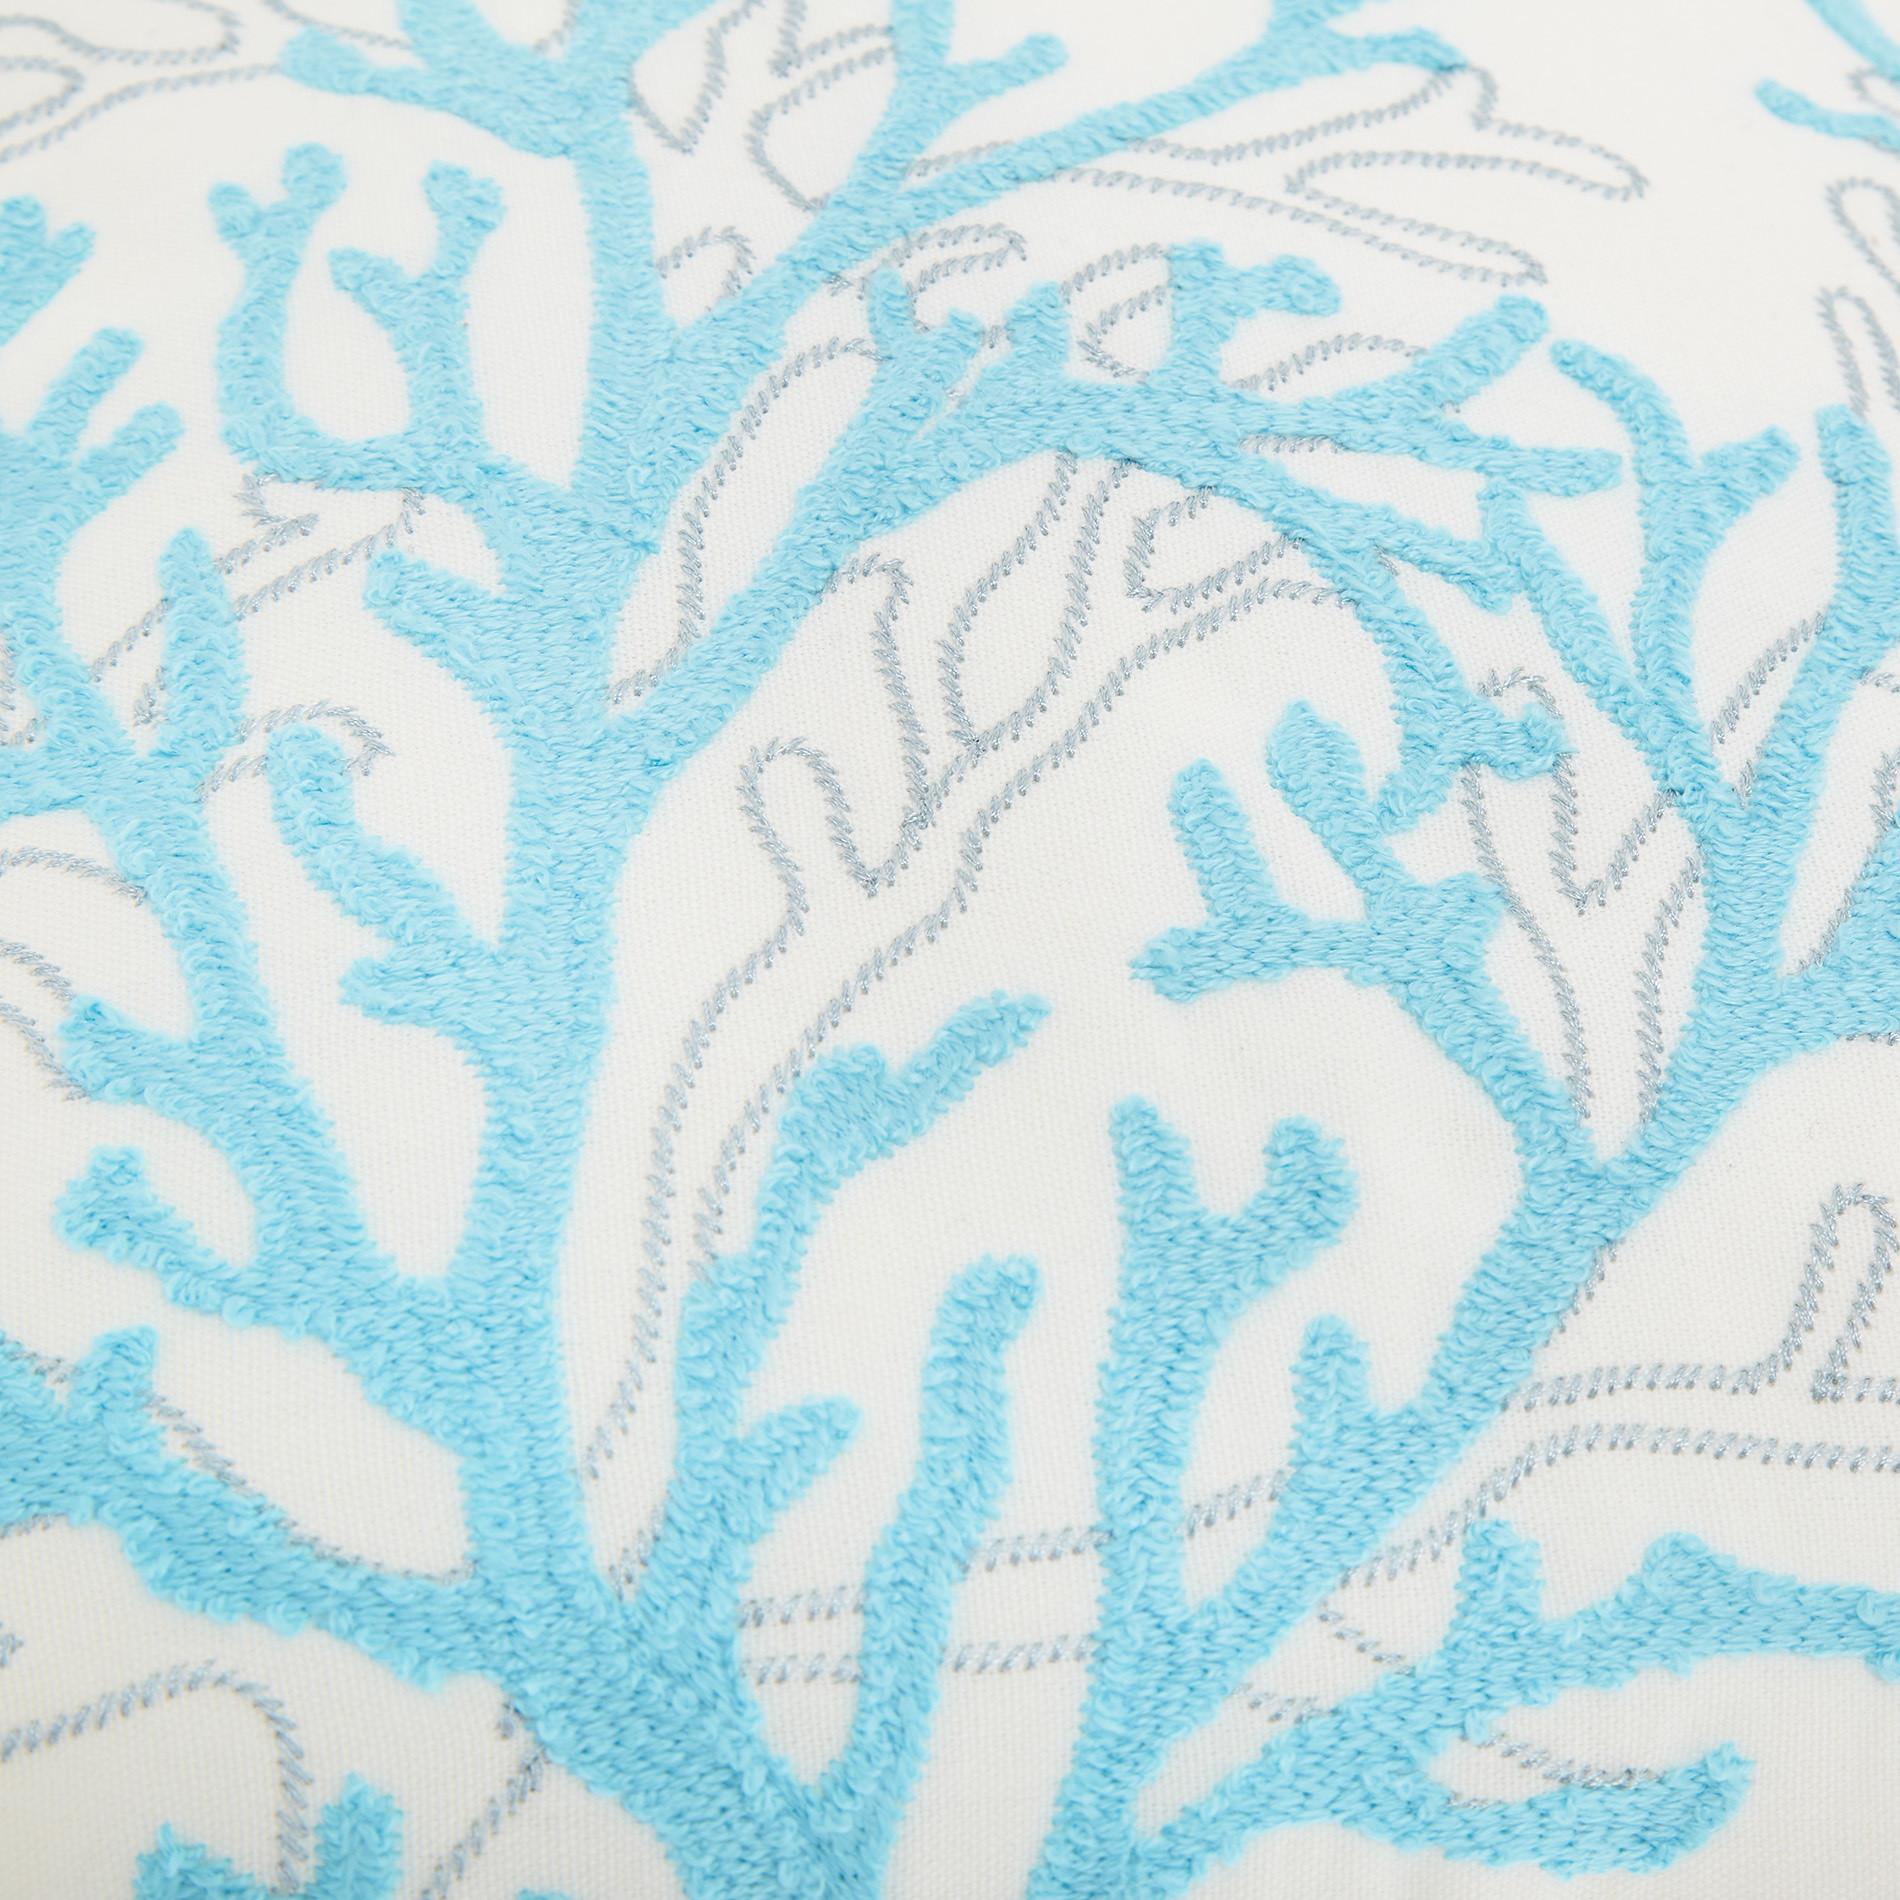 Cuscino ricamo coralli 45x45cm, Azzurro, large image number 3